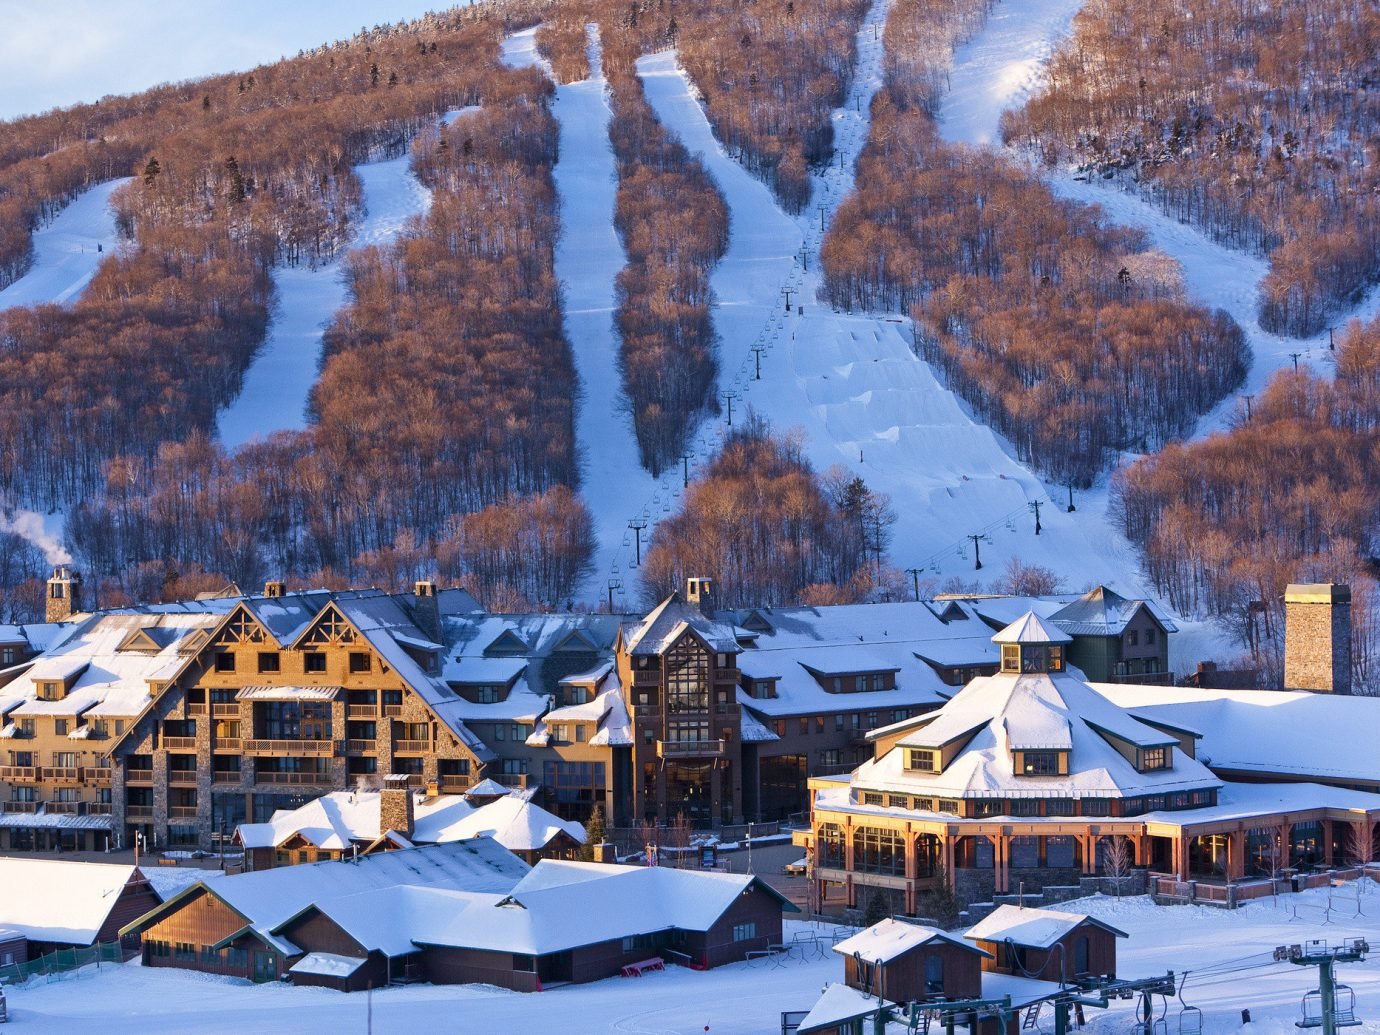 Hotels Weekend Getaways snow Winter outdoor mountain weather season geological phenomenon Resort mountain range piste